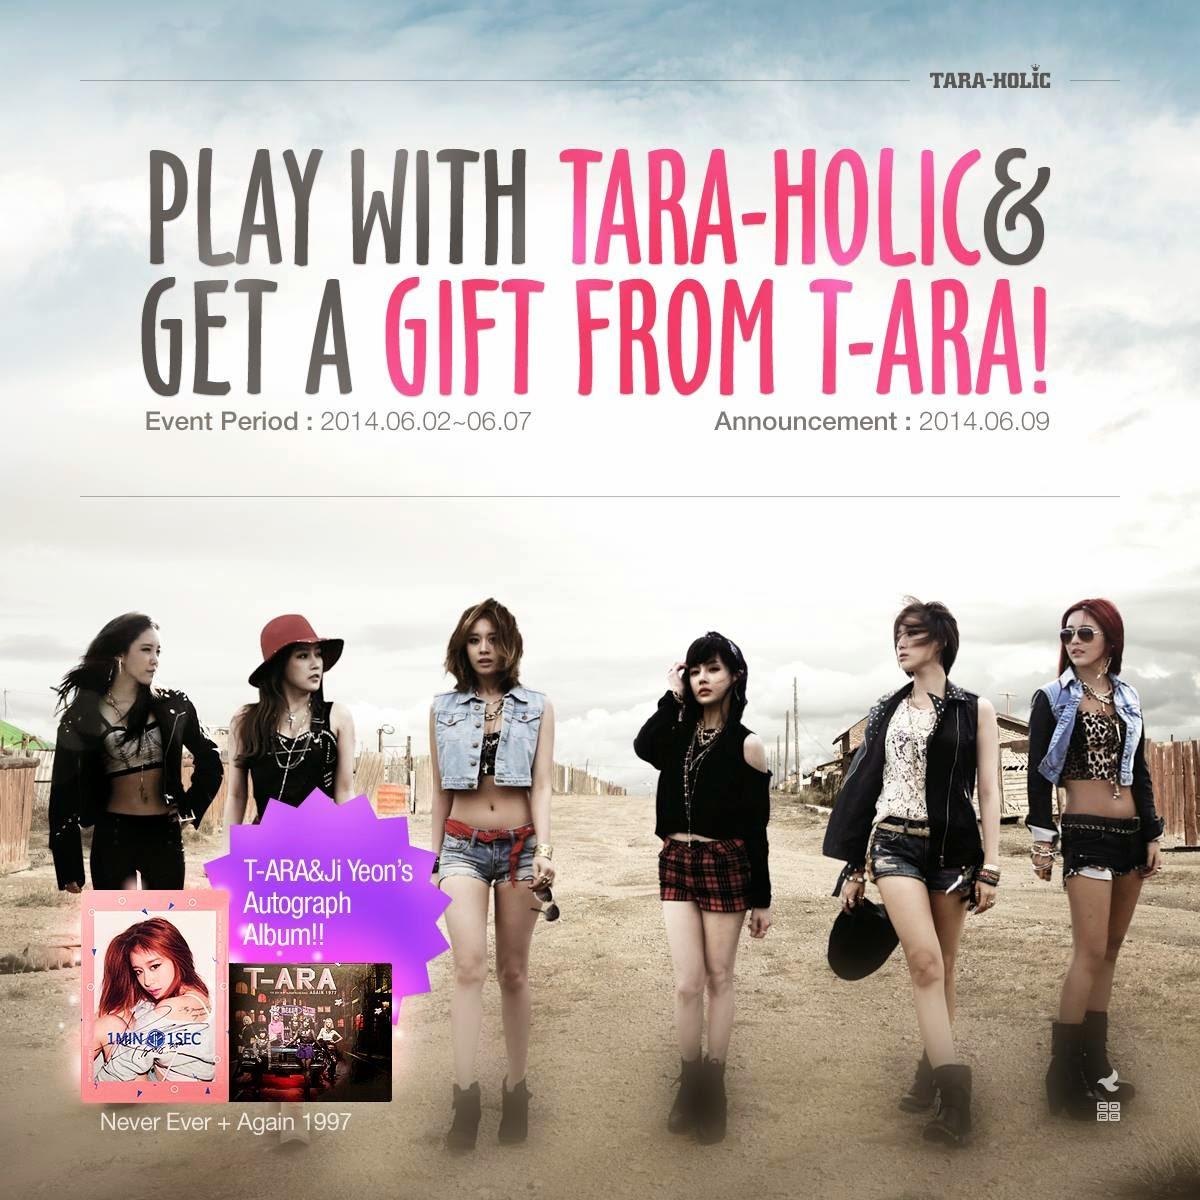 Join T-ara's Album Giveaway on their 'TARA-HOLIC' App!